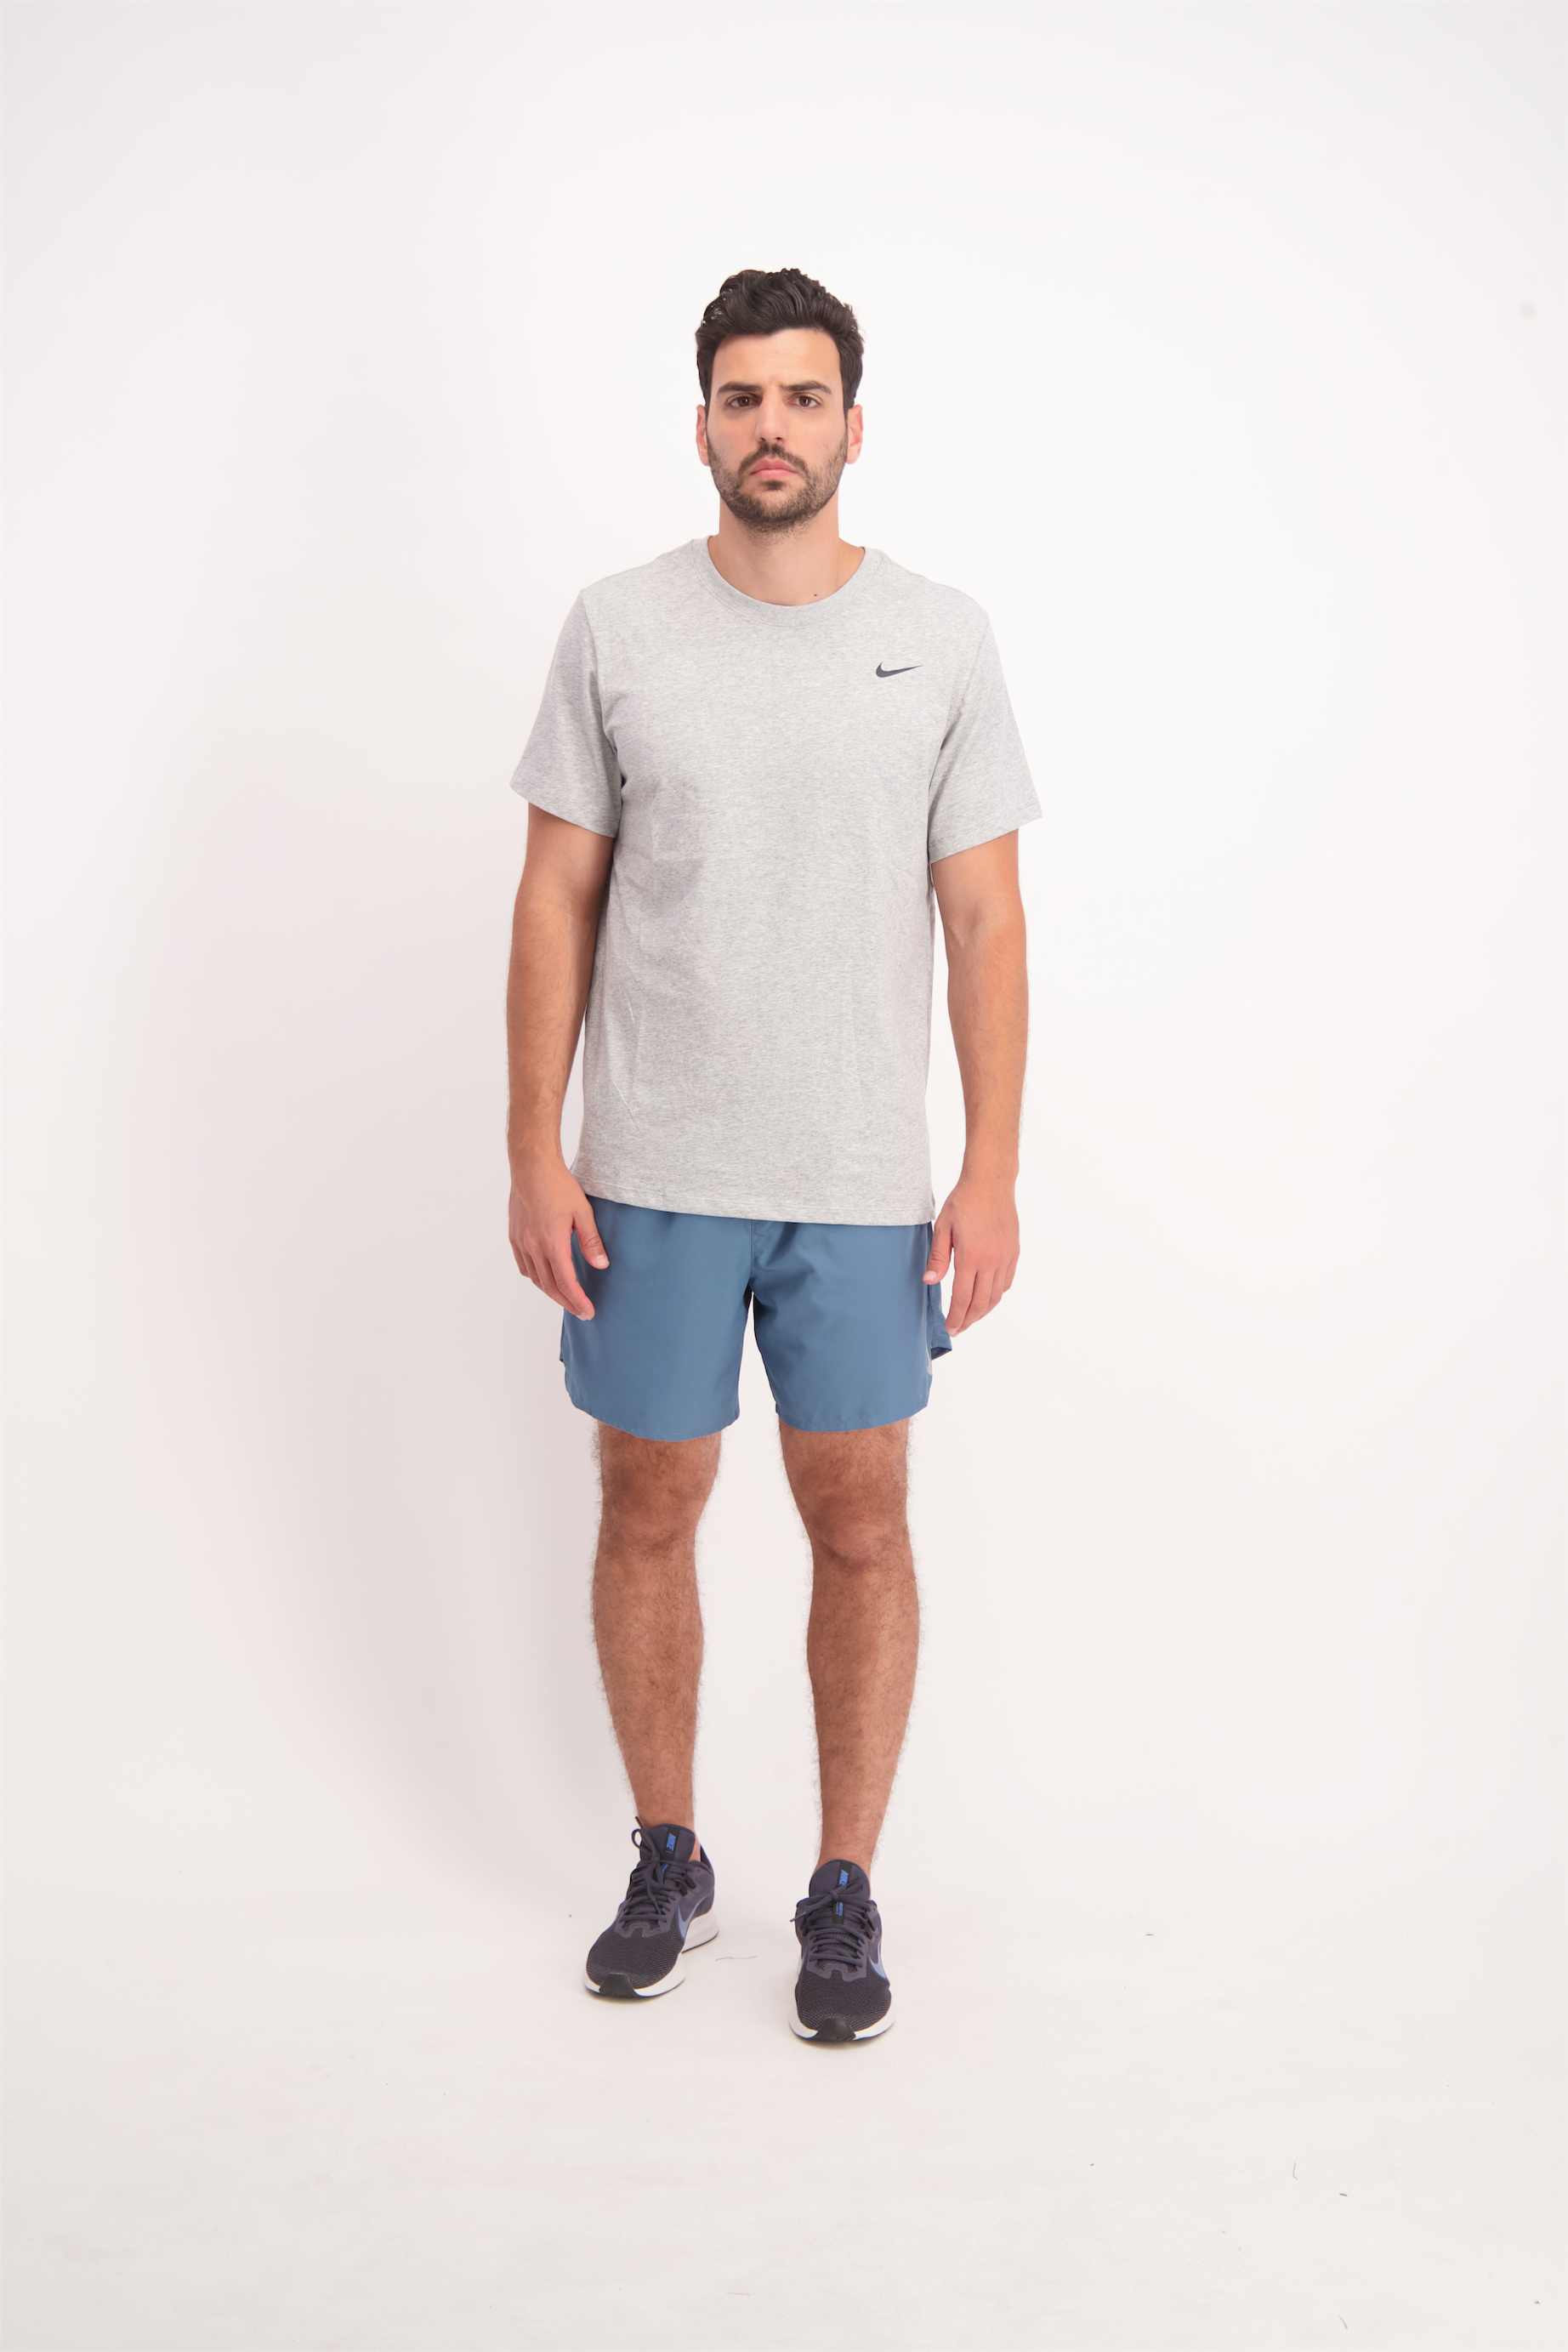 NIKE חולצת גברים